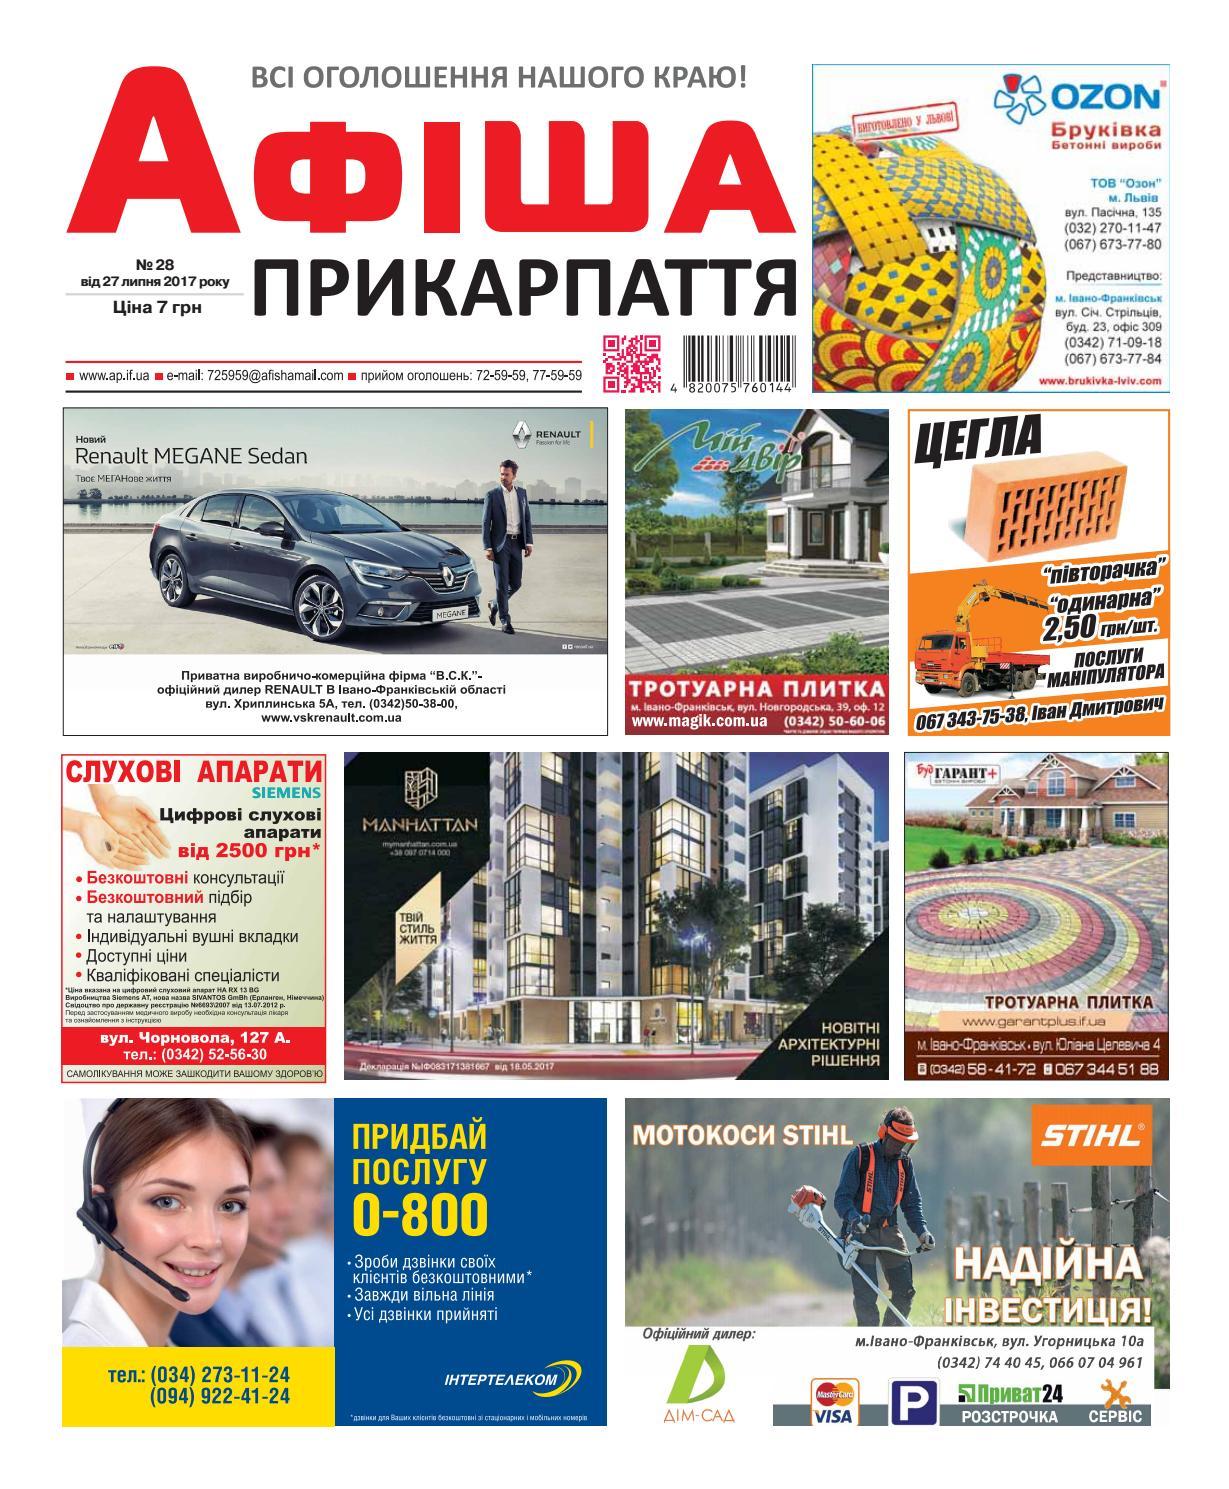 Афіша Прикарпаття 28 by Olya Olya - issuu a5370d0776dc6